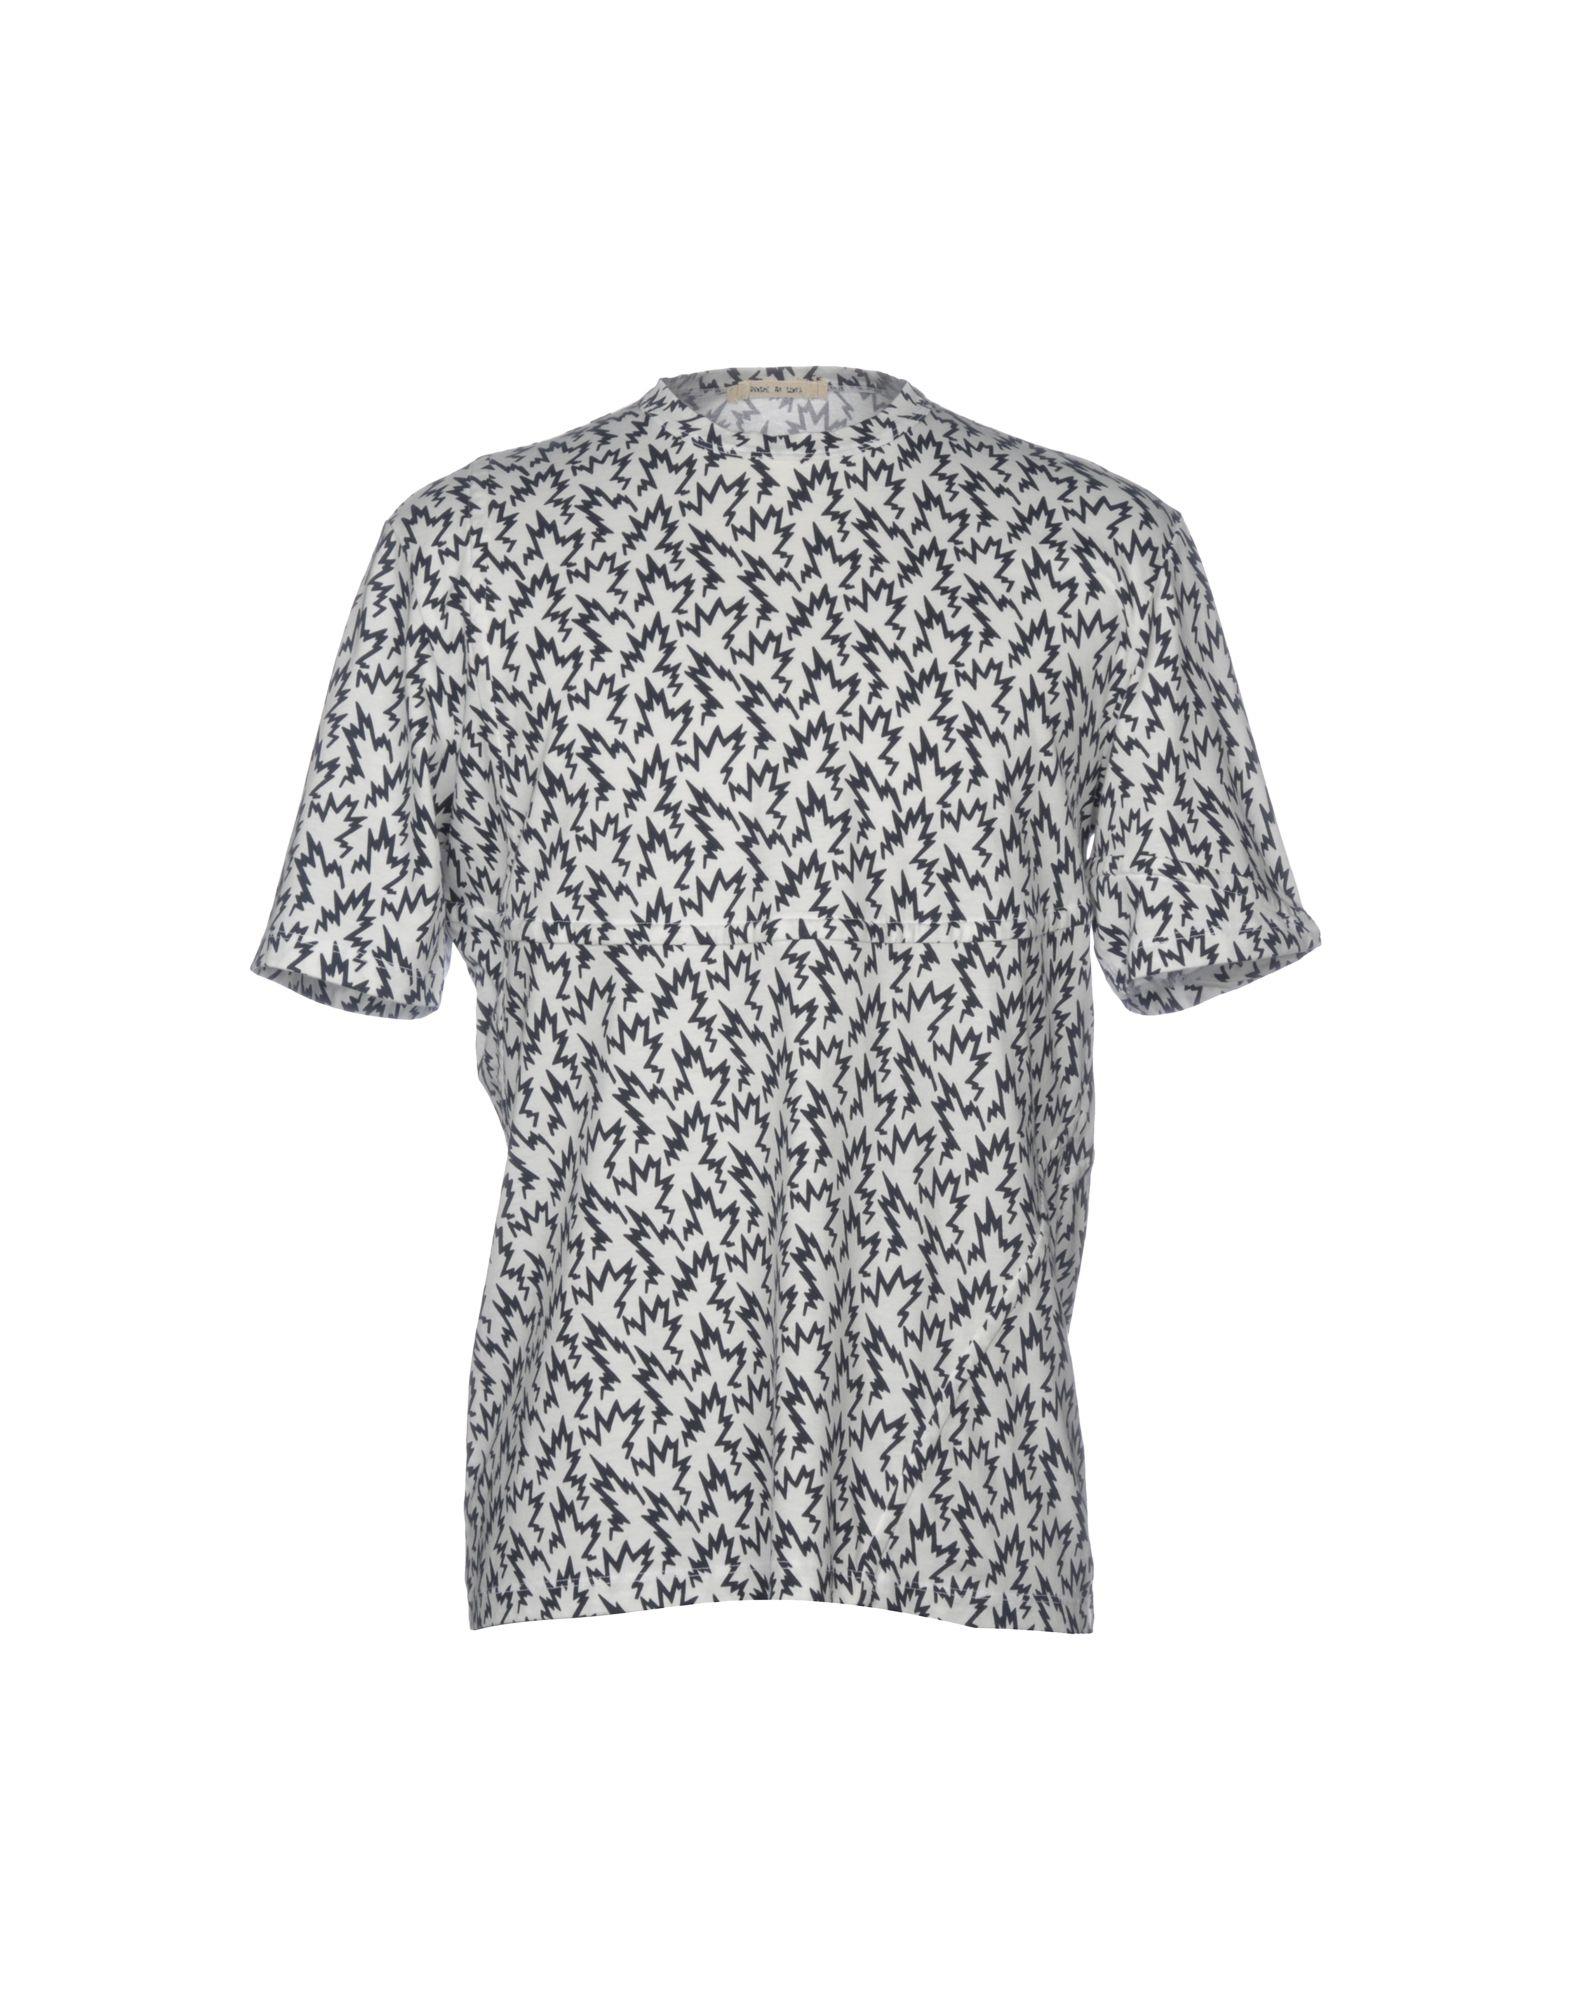 A buon mercato A buon mercato T-Shirt 12202455DE Marni Uomo - 12202455DE T-Shirt 926518